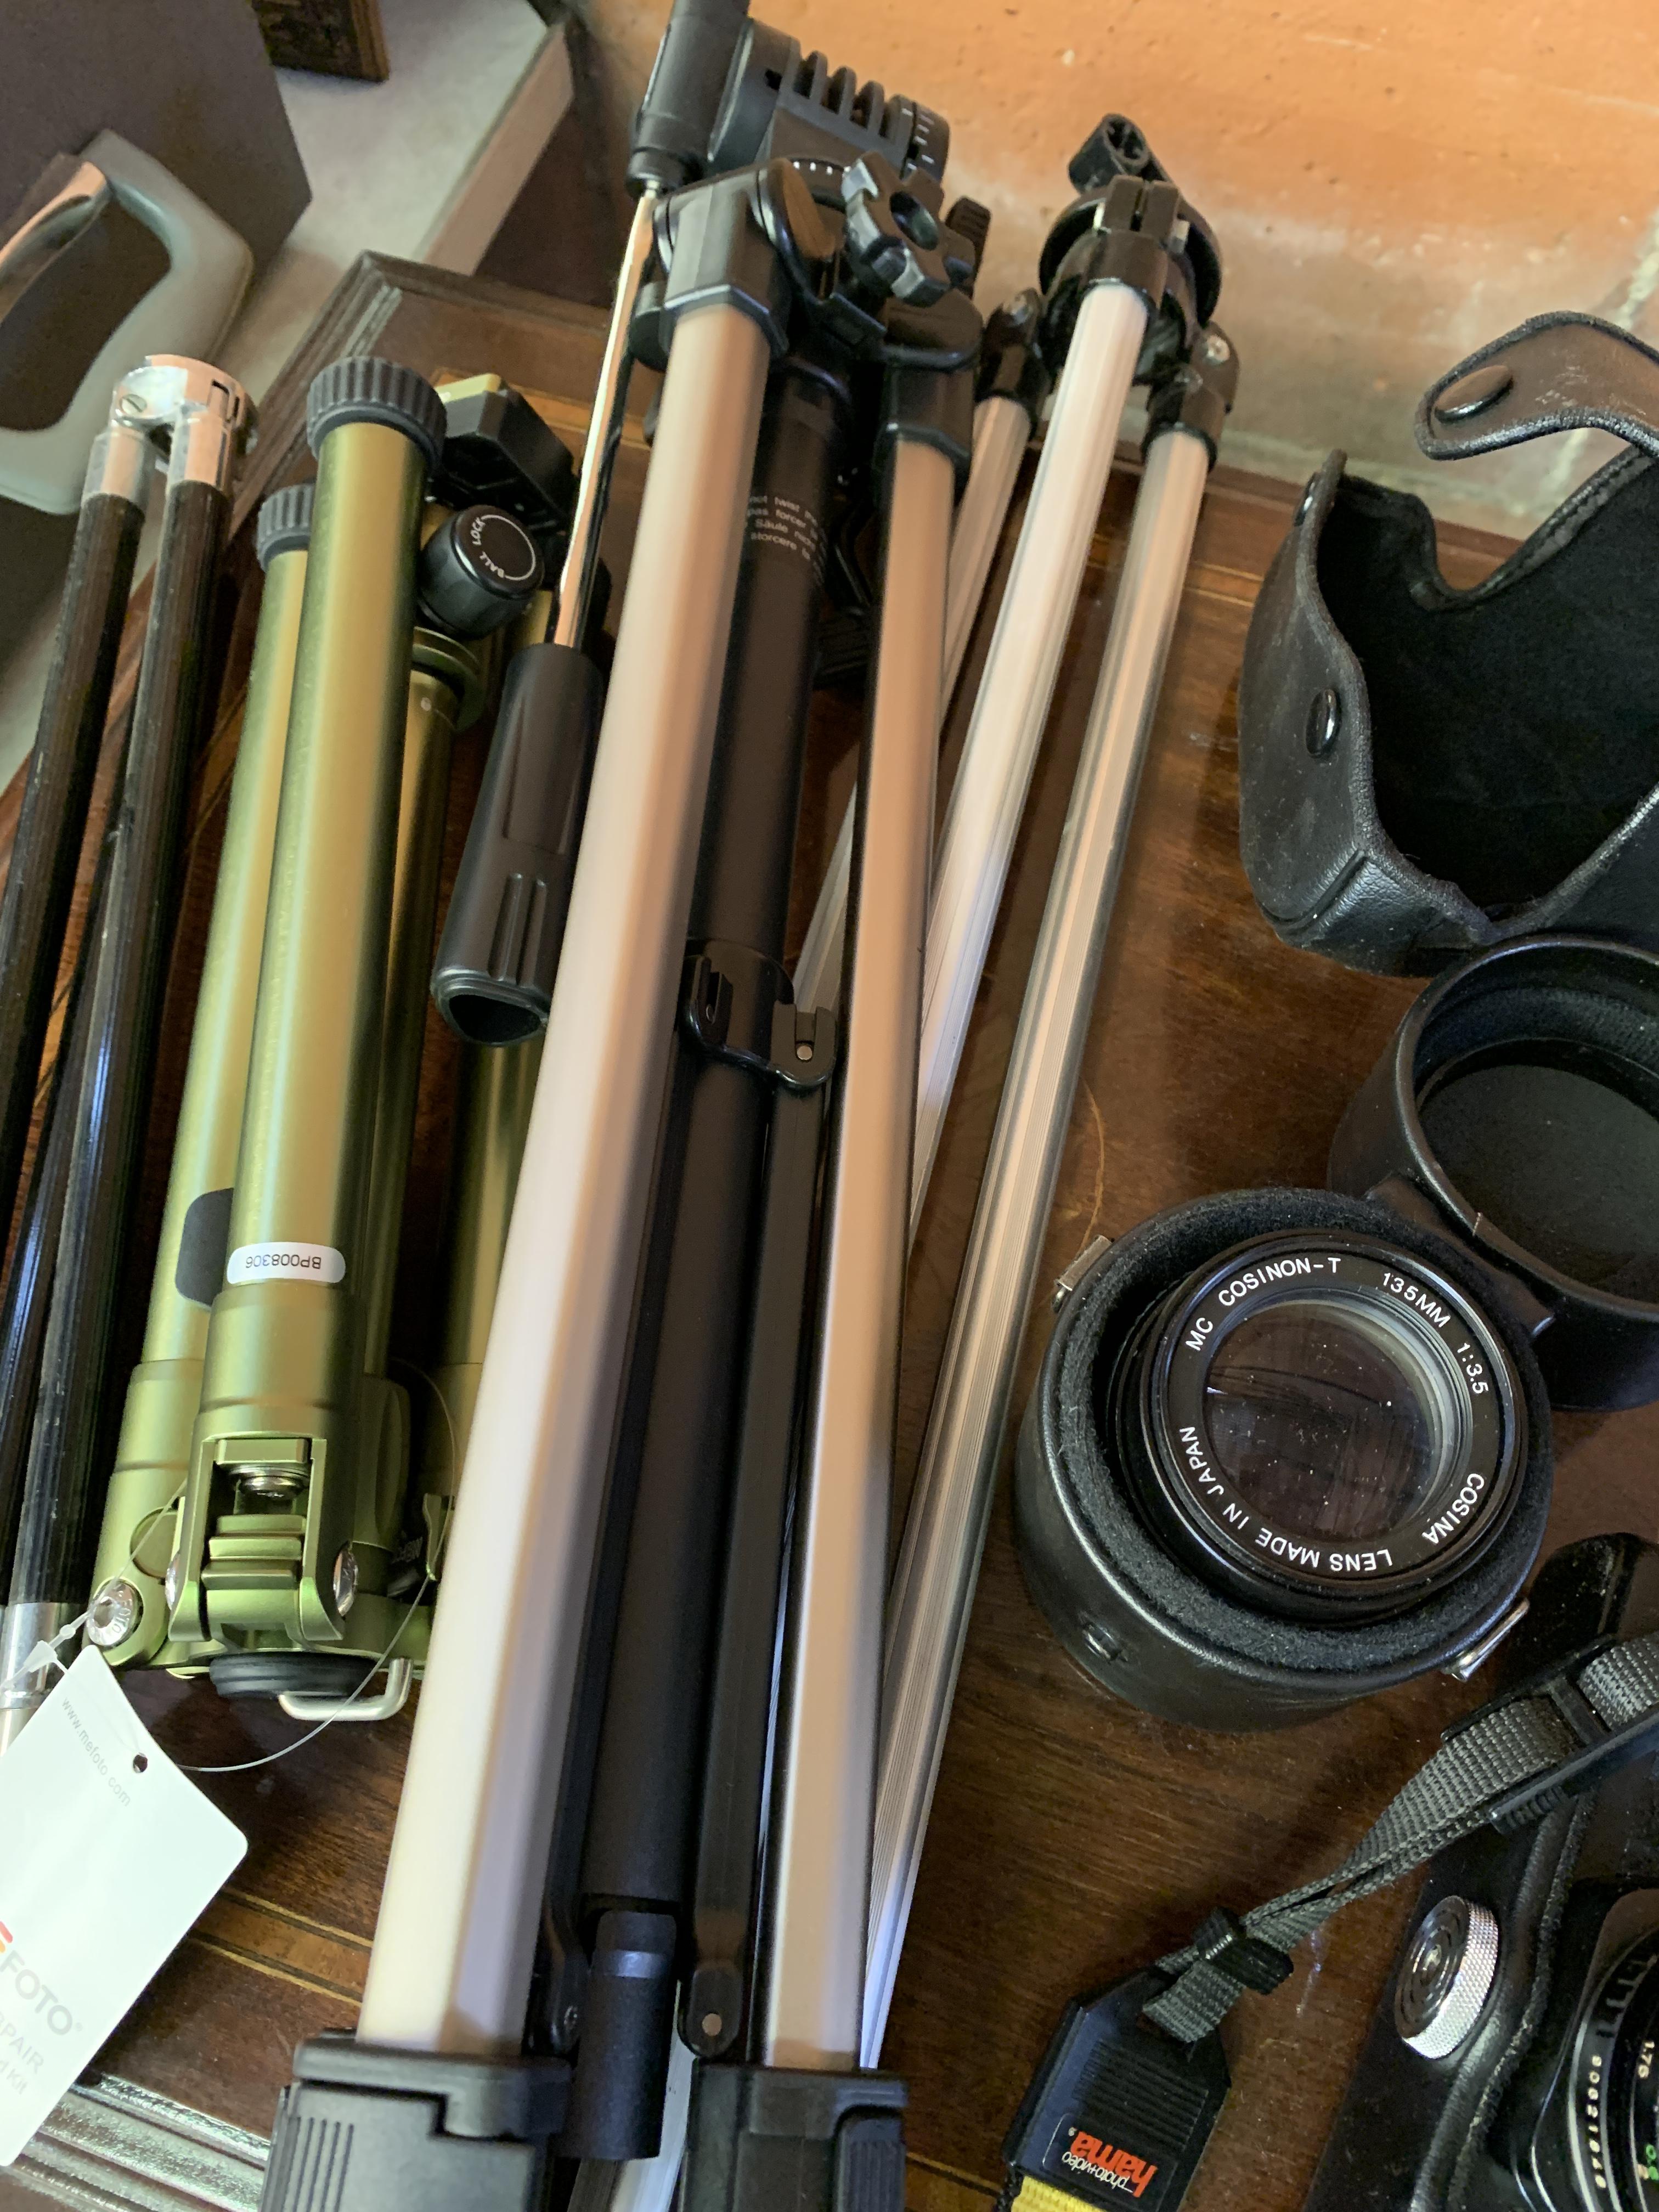 Camera equipment - Image 4 of 4